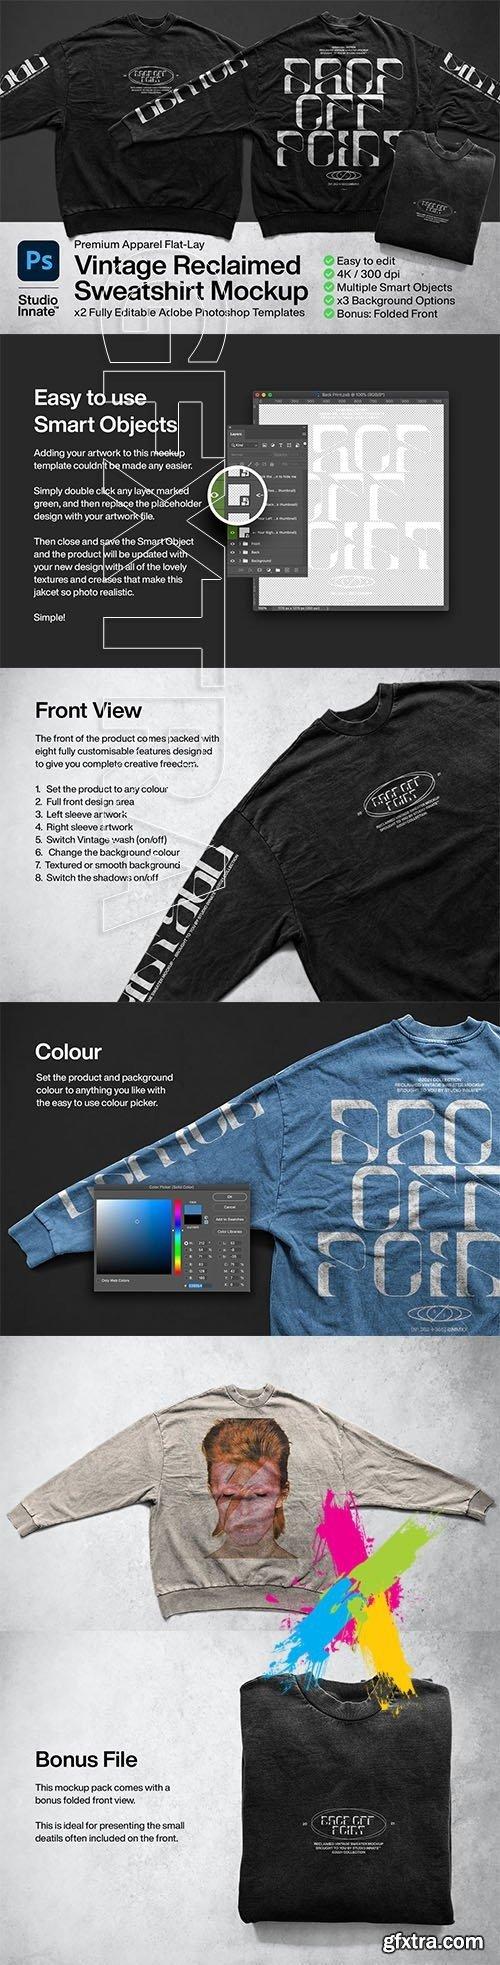 CreativeMarket - Vintage Reclaimed Sweatshirt Mockup 5755542